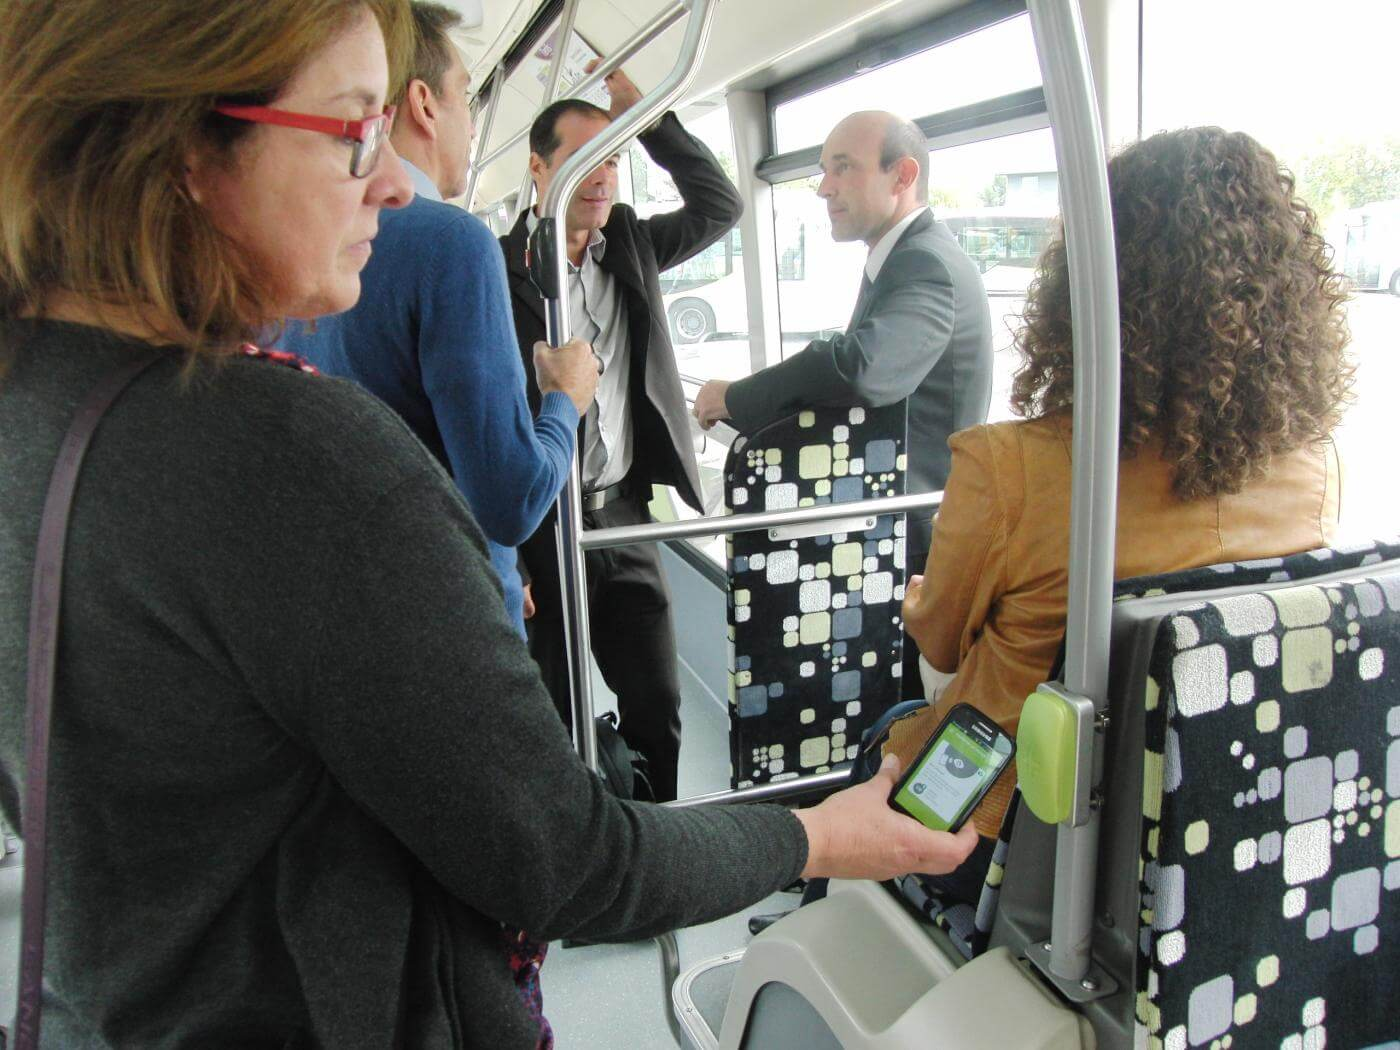 billettique transport commun abonnement